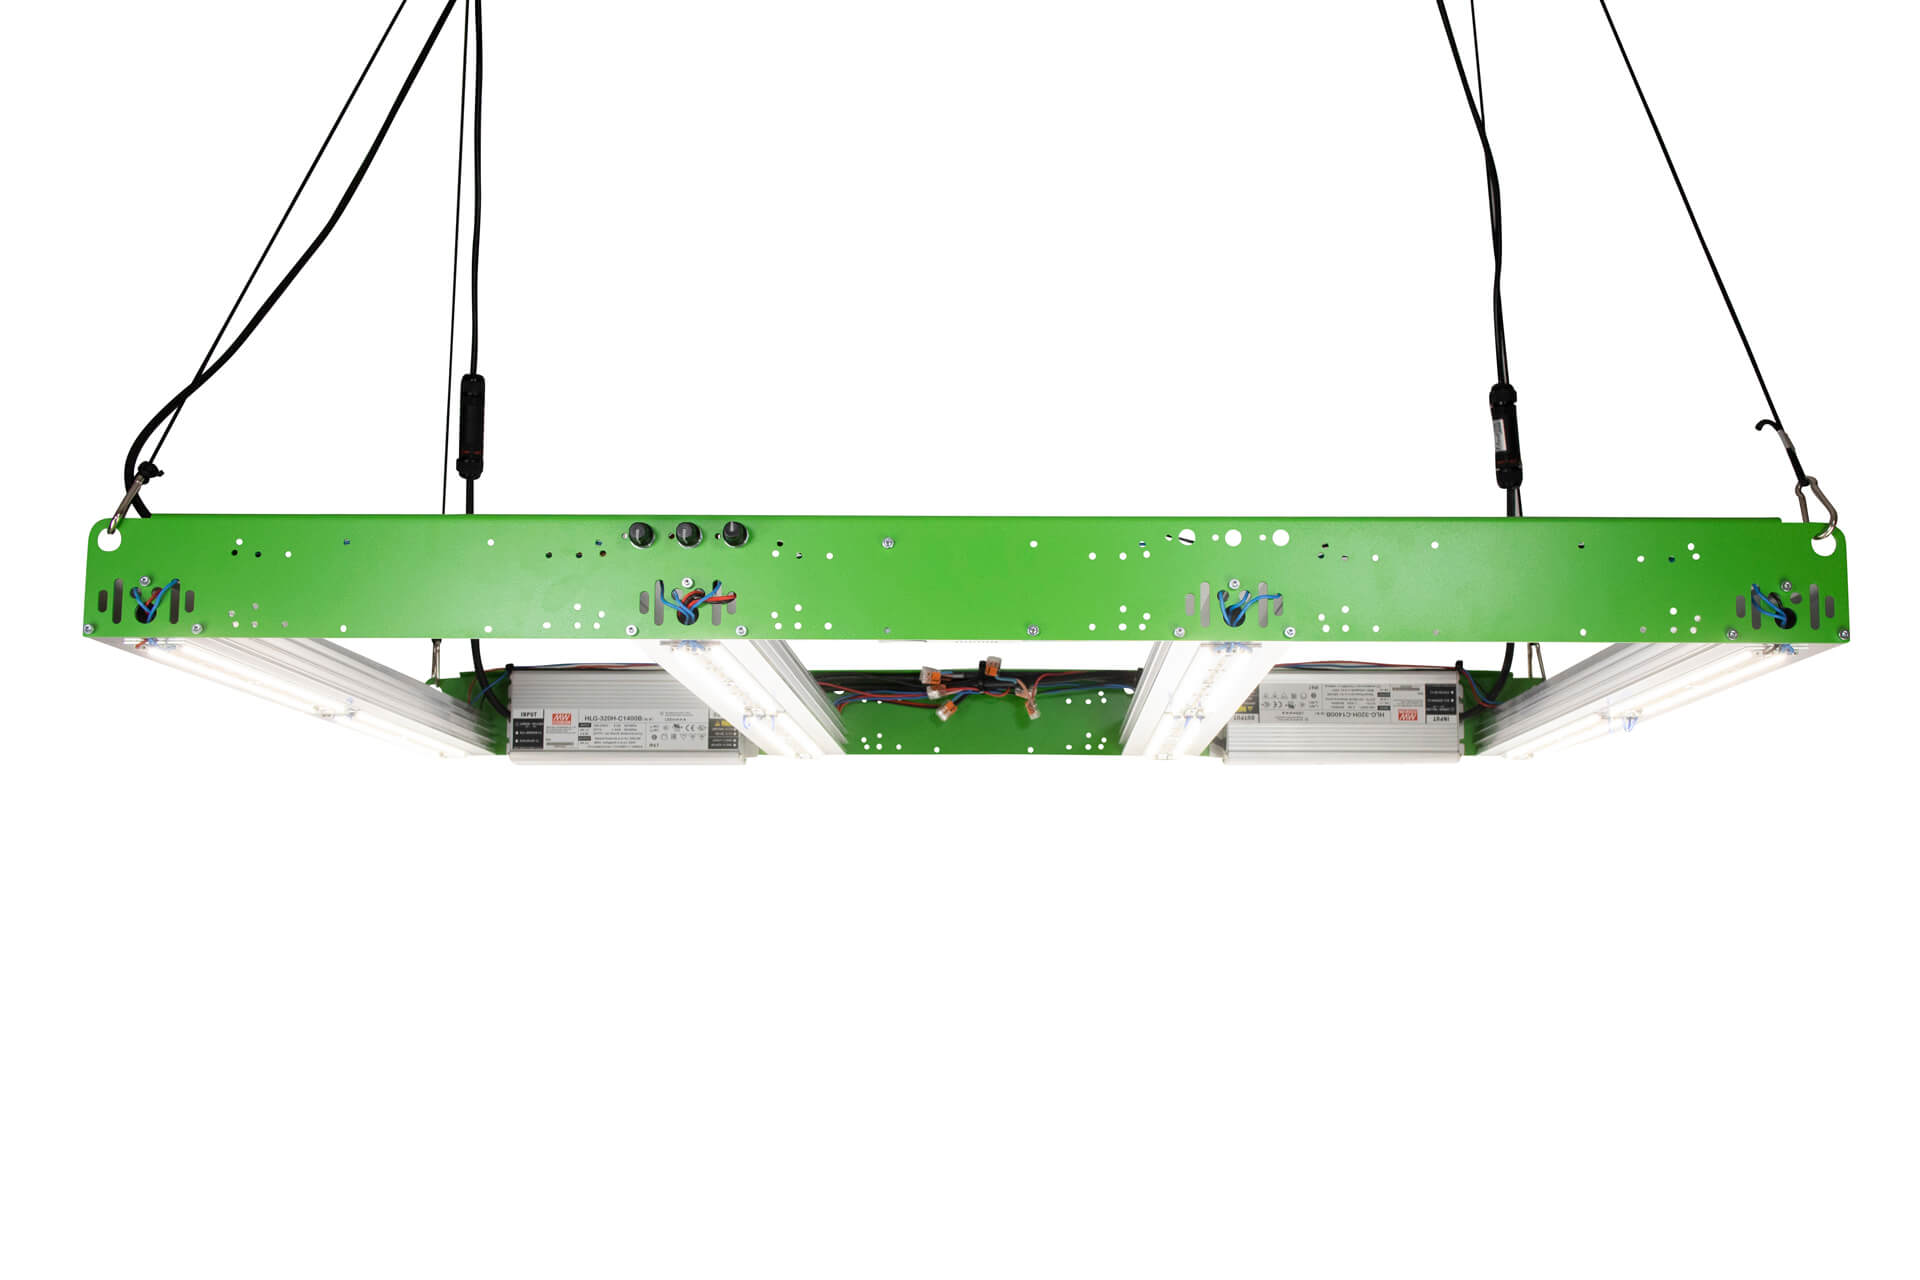 DIY-M-KIT-2-Series-long-600w-veg-channel-on-pro-emit